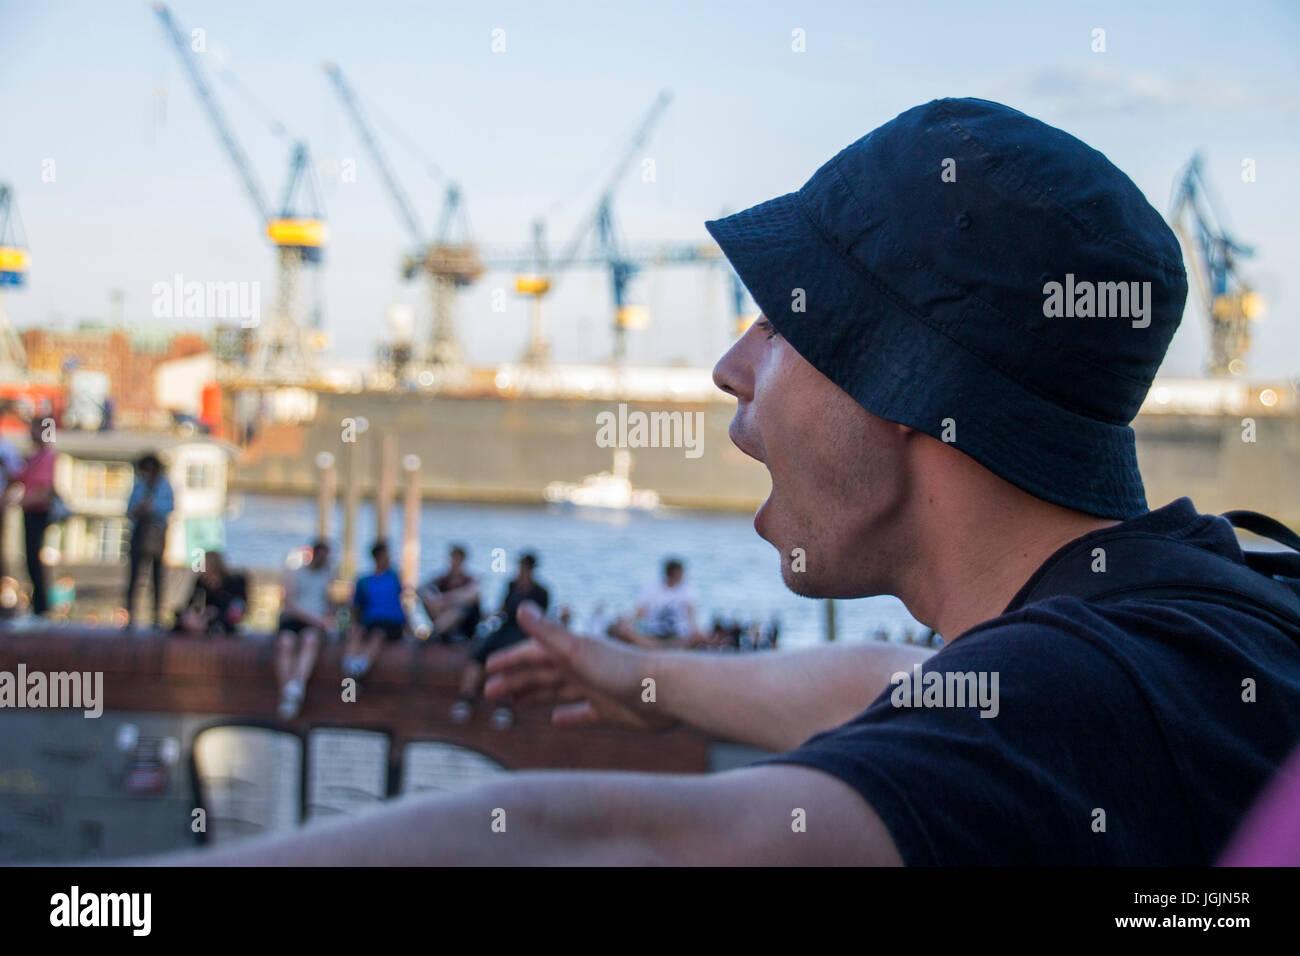 Hamburg, Germany. 6th Jul, 2017. Fishmarket/Hamburg - Germany July 6, 2017: Protestant is cursing at the police. Stock Photo